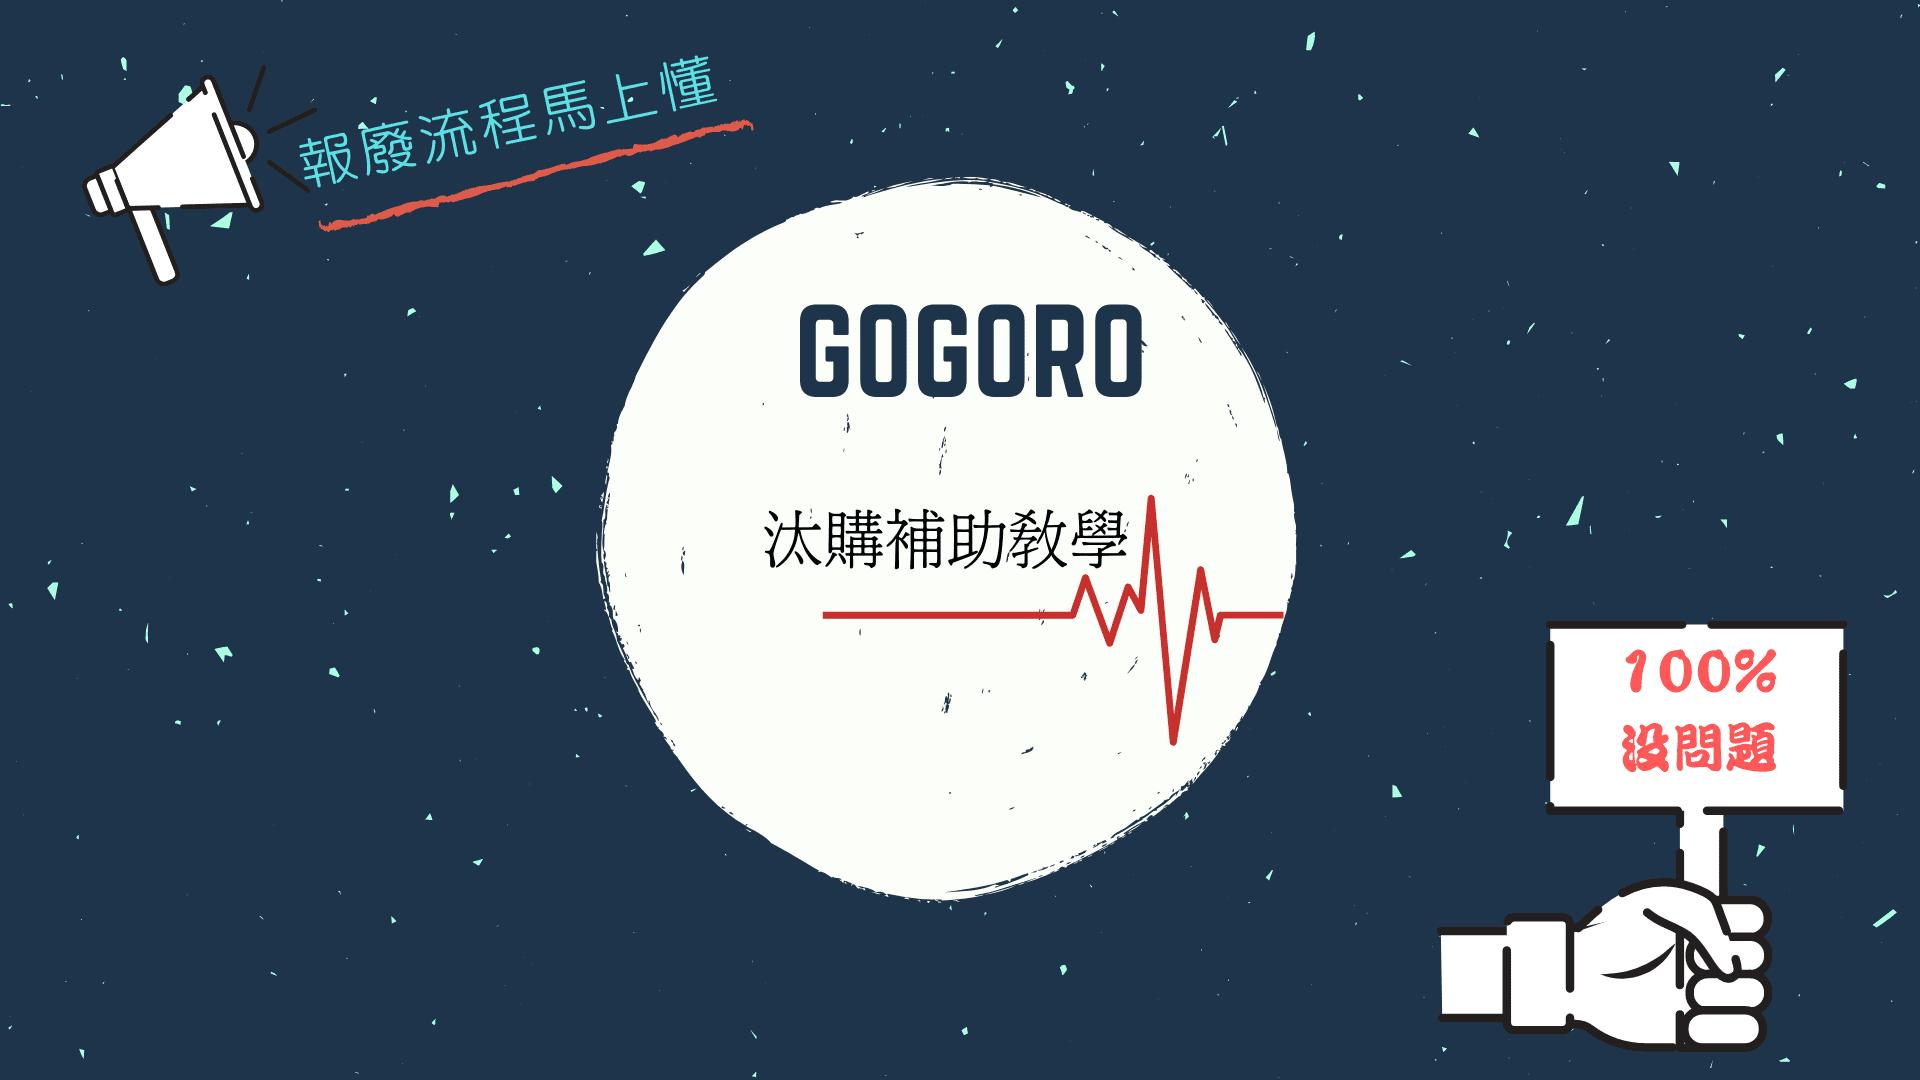 【Gogoro汰購補助流程】這樣報廢就不會拿不到電動車補助!(PBGN適用)